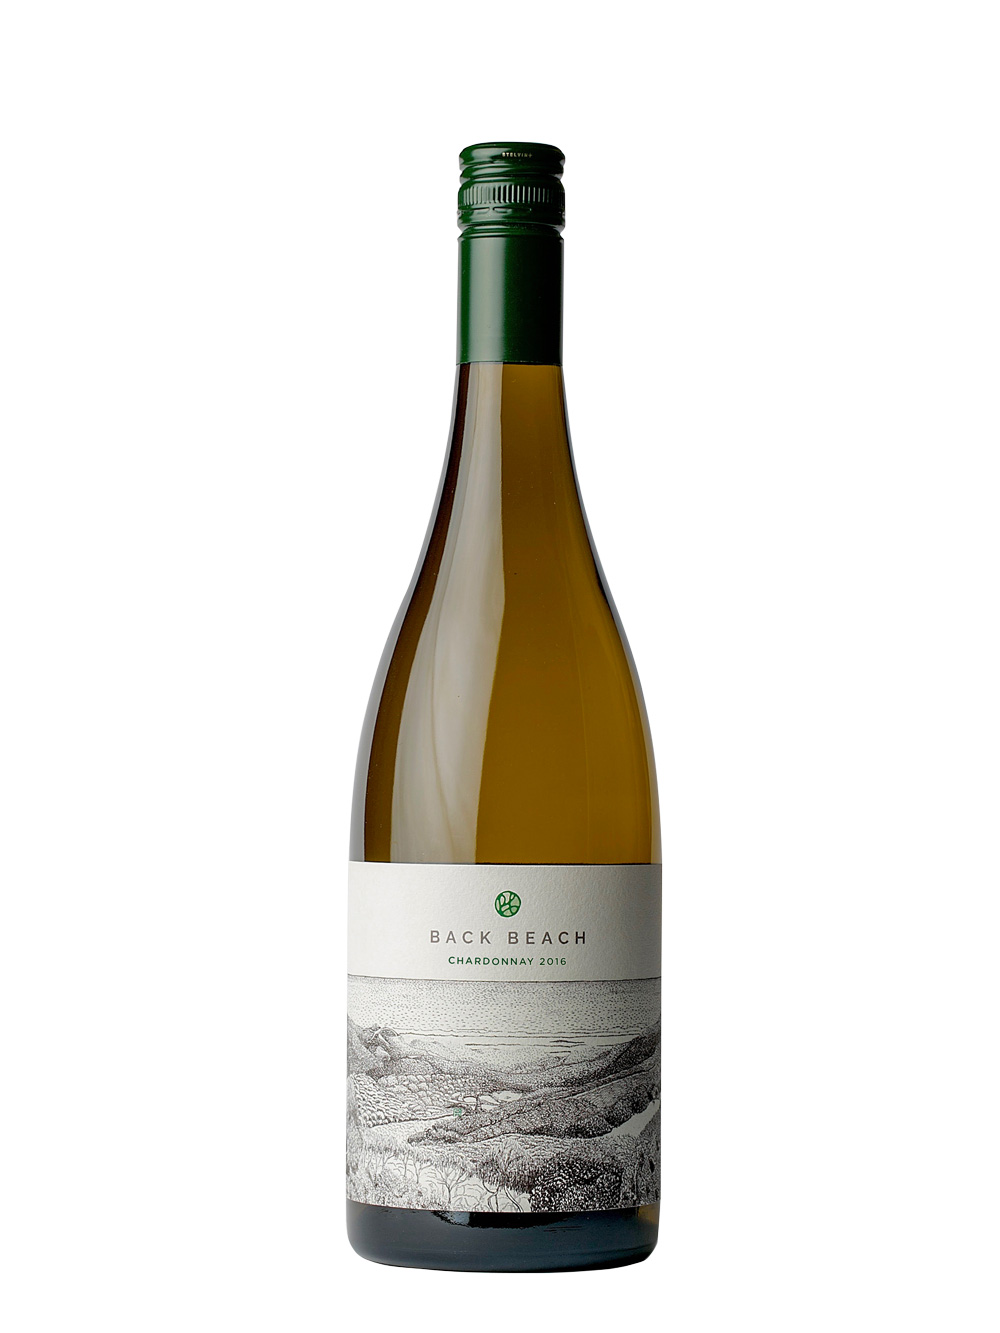 2016 Back Beach Chardonnay